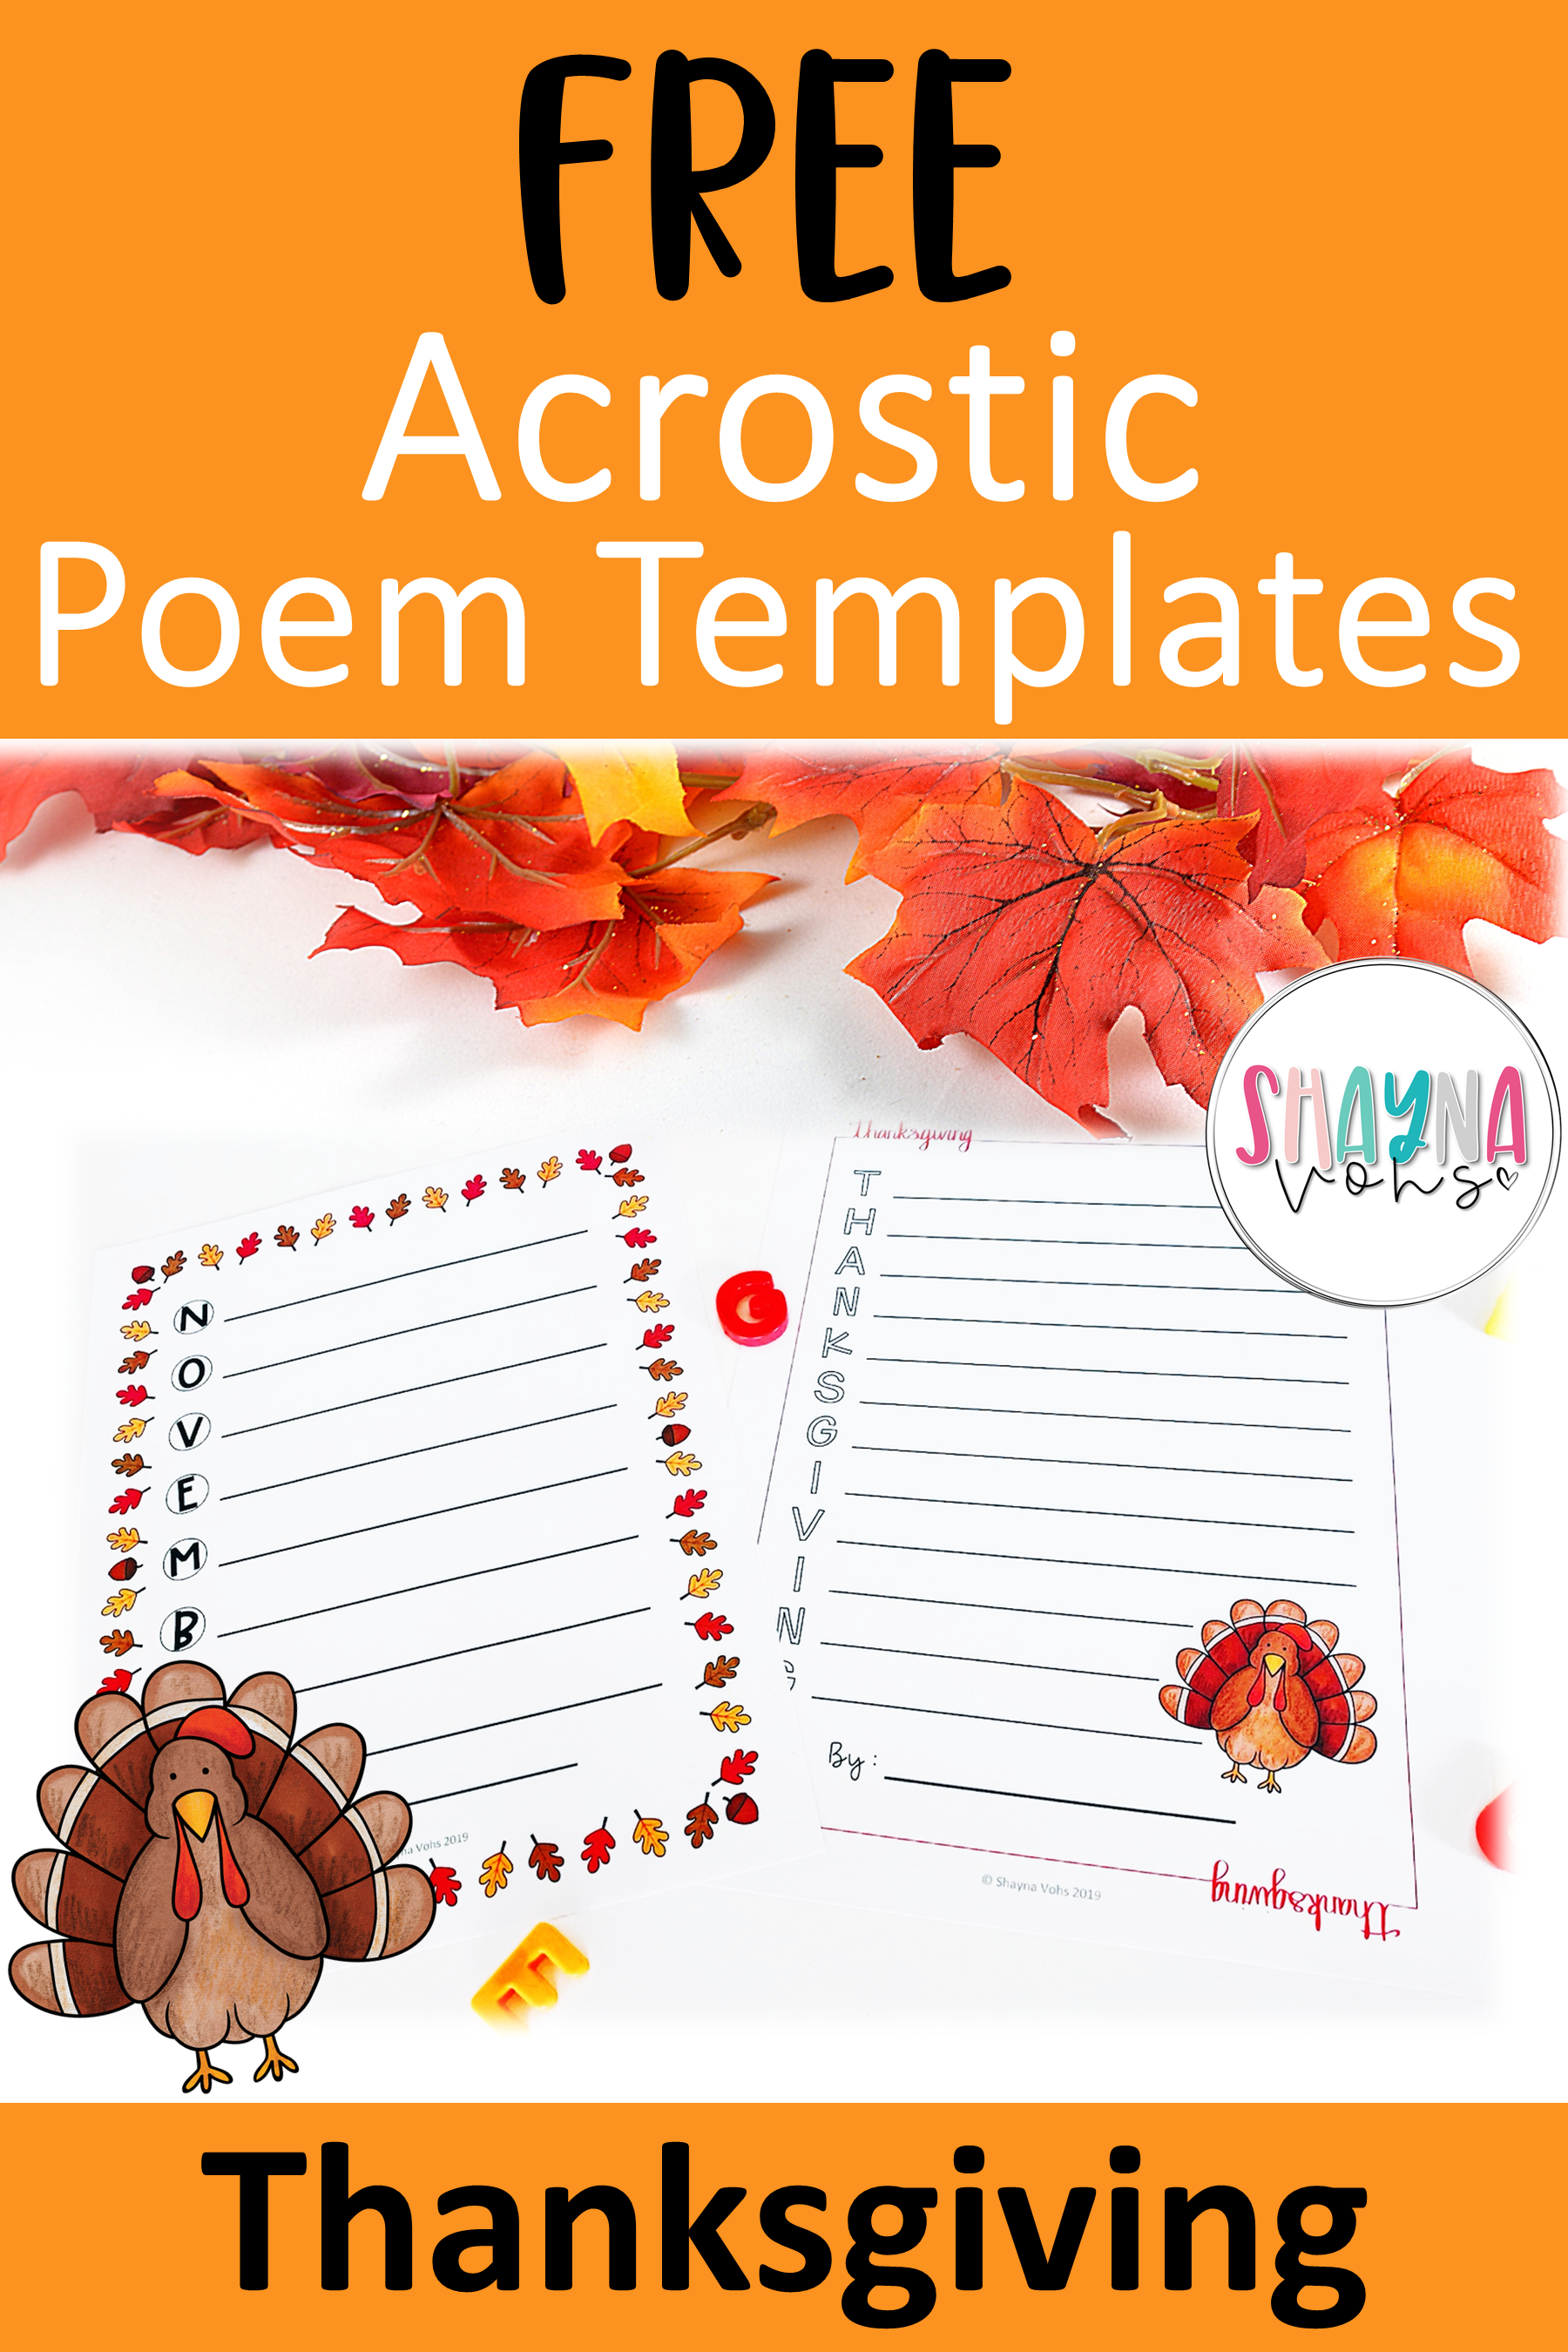 Free Thanksgiving Acrostic Poems